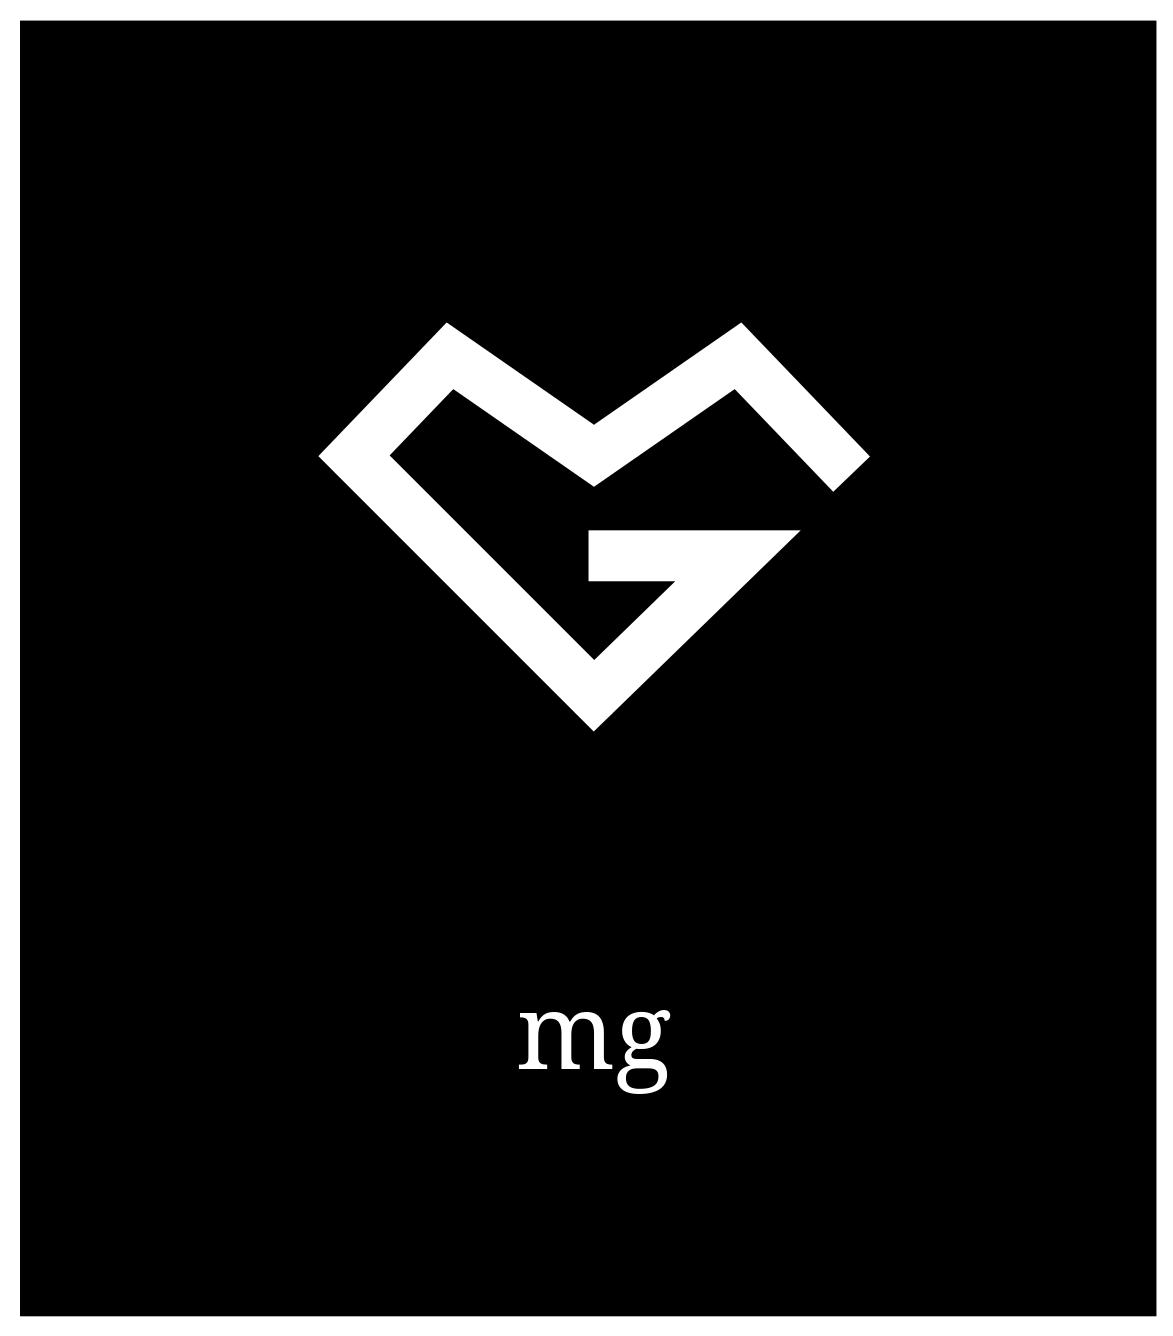 Custom Design by JaroslavProcka - Entry No. 205 in the Custom Design Contest Imaginative Custom Design for MG.